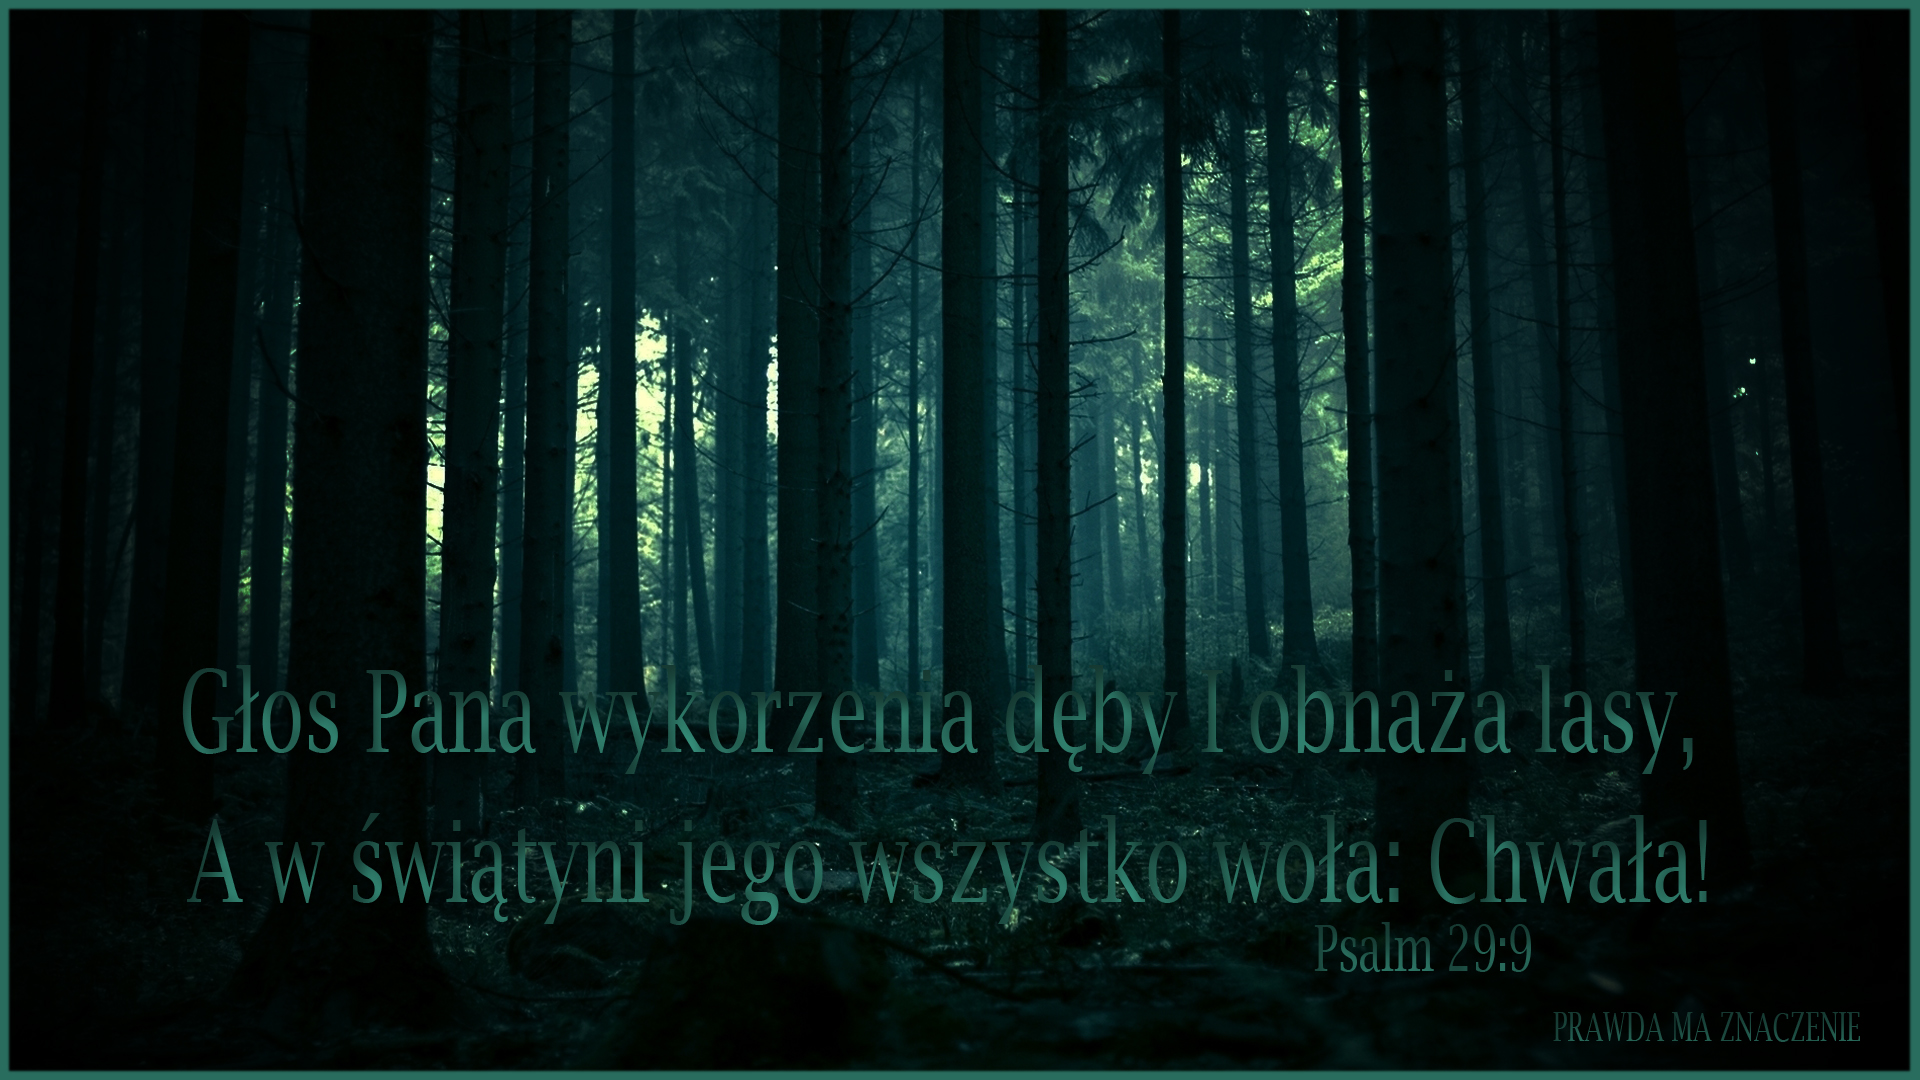 PSALM 29 9